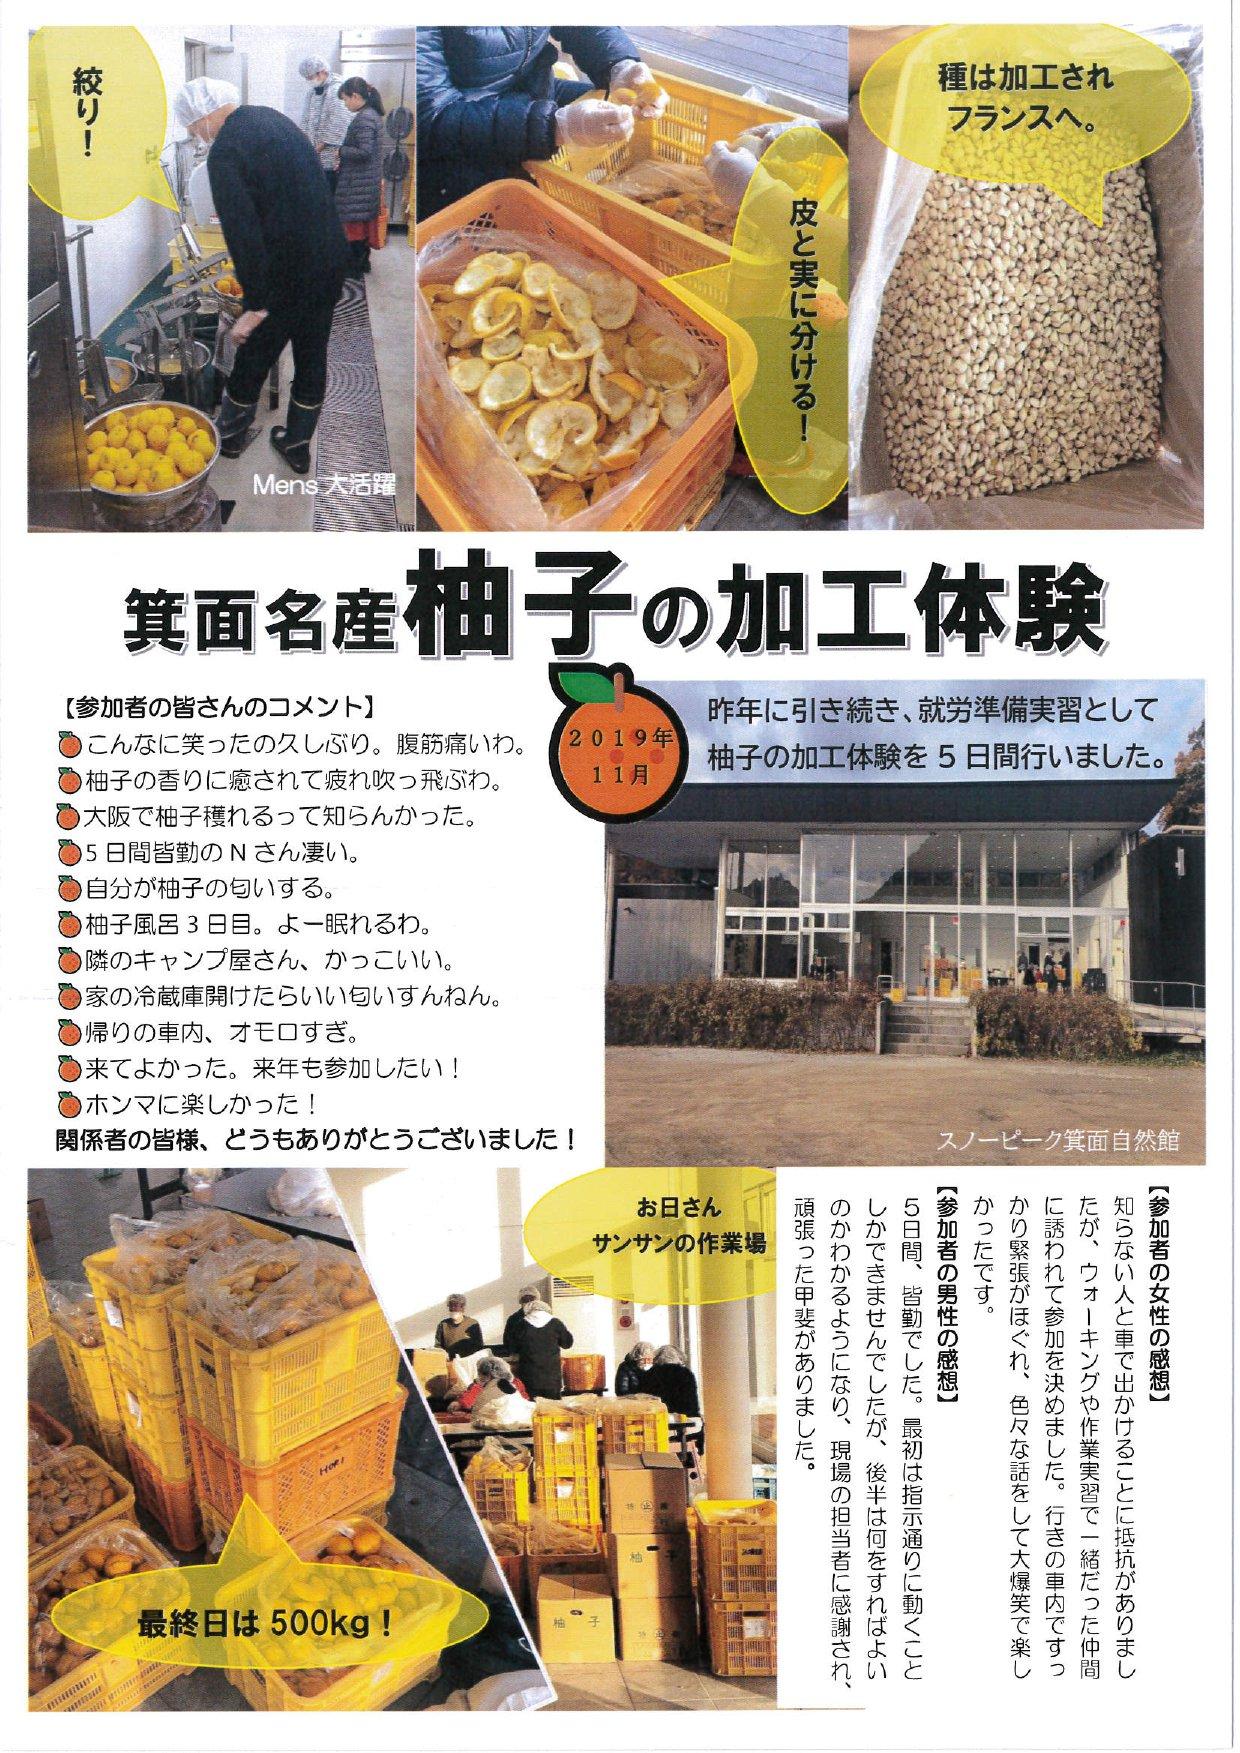 kurasuppo-news20.03-29-02.jpg